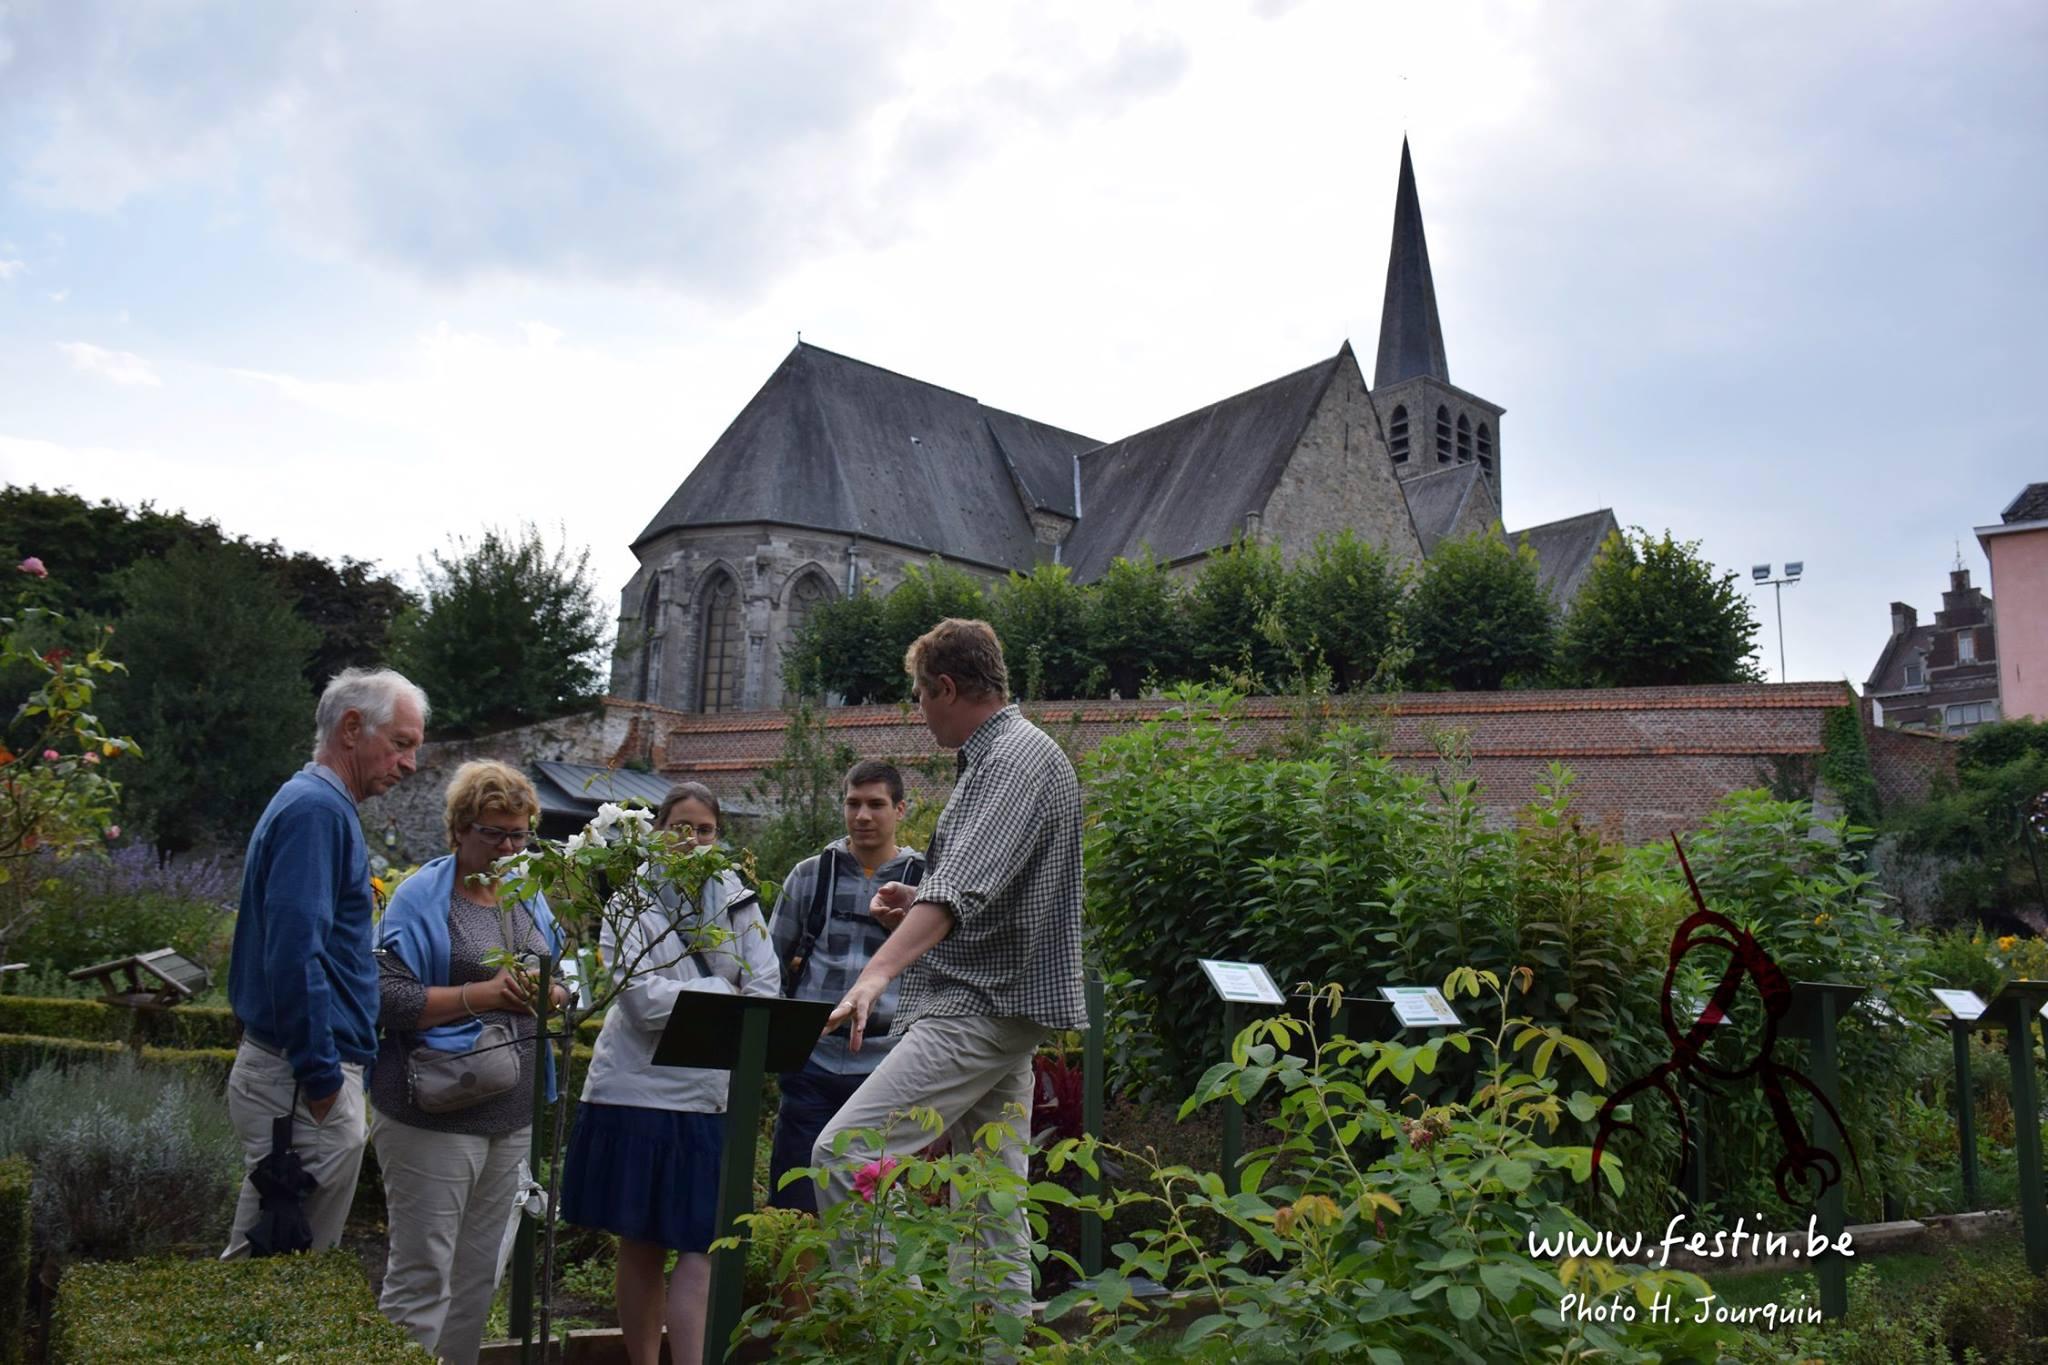 Yves Vanopdenbosch sera présent dans nos jardins de simples le samedi 14/07